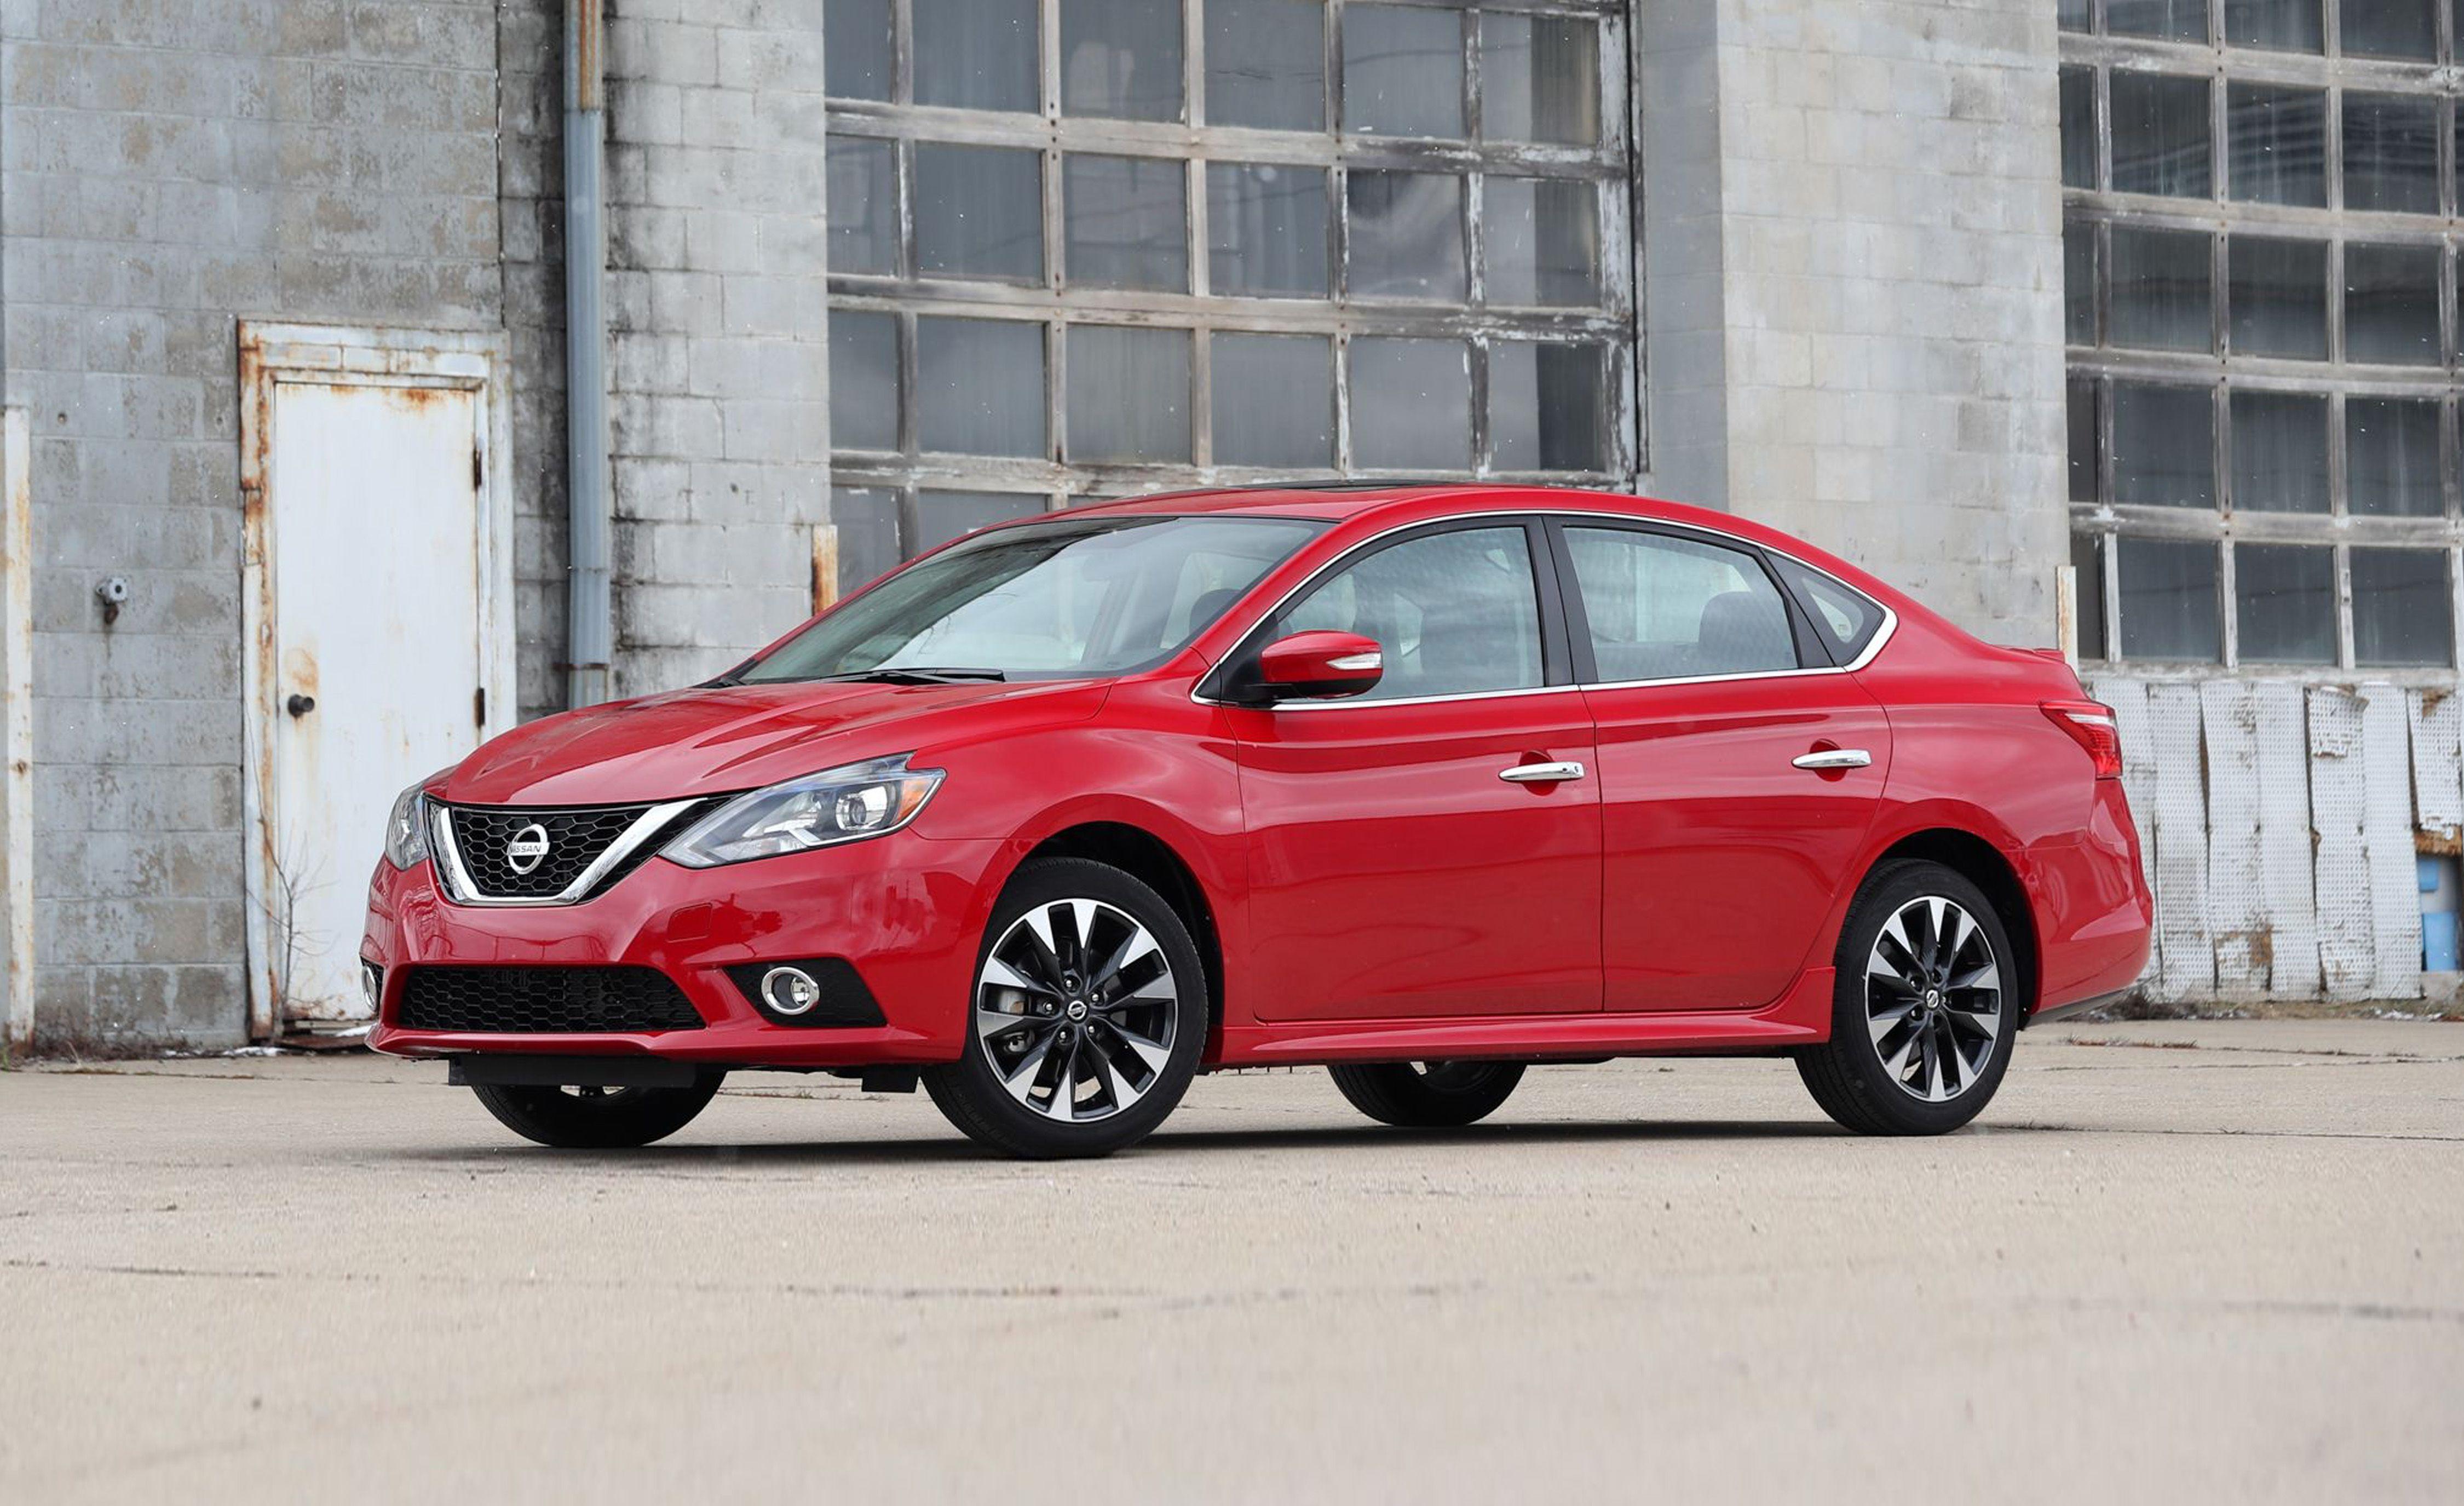 2019 Nissan Sentra Reviews | Nissan Sentra Price, Photos ...